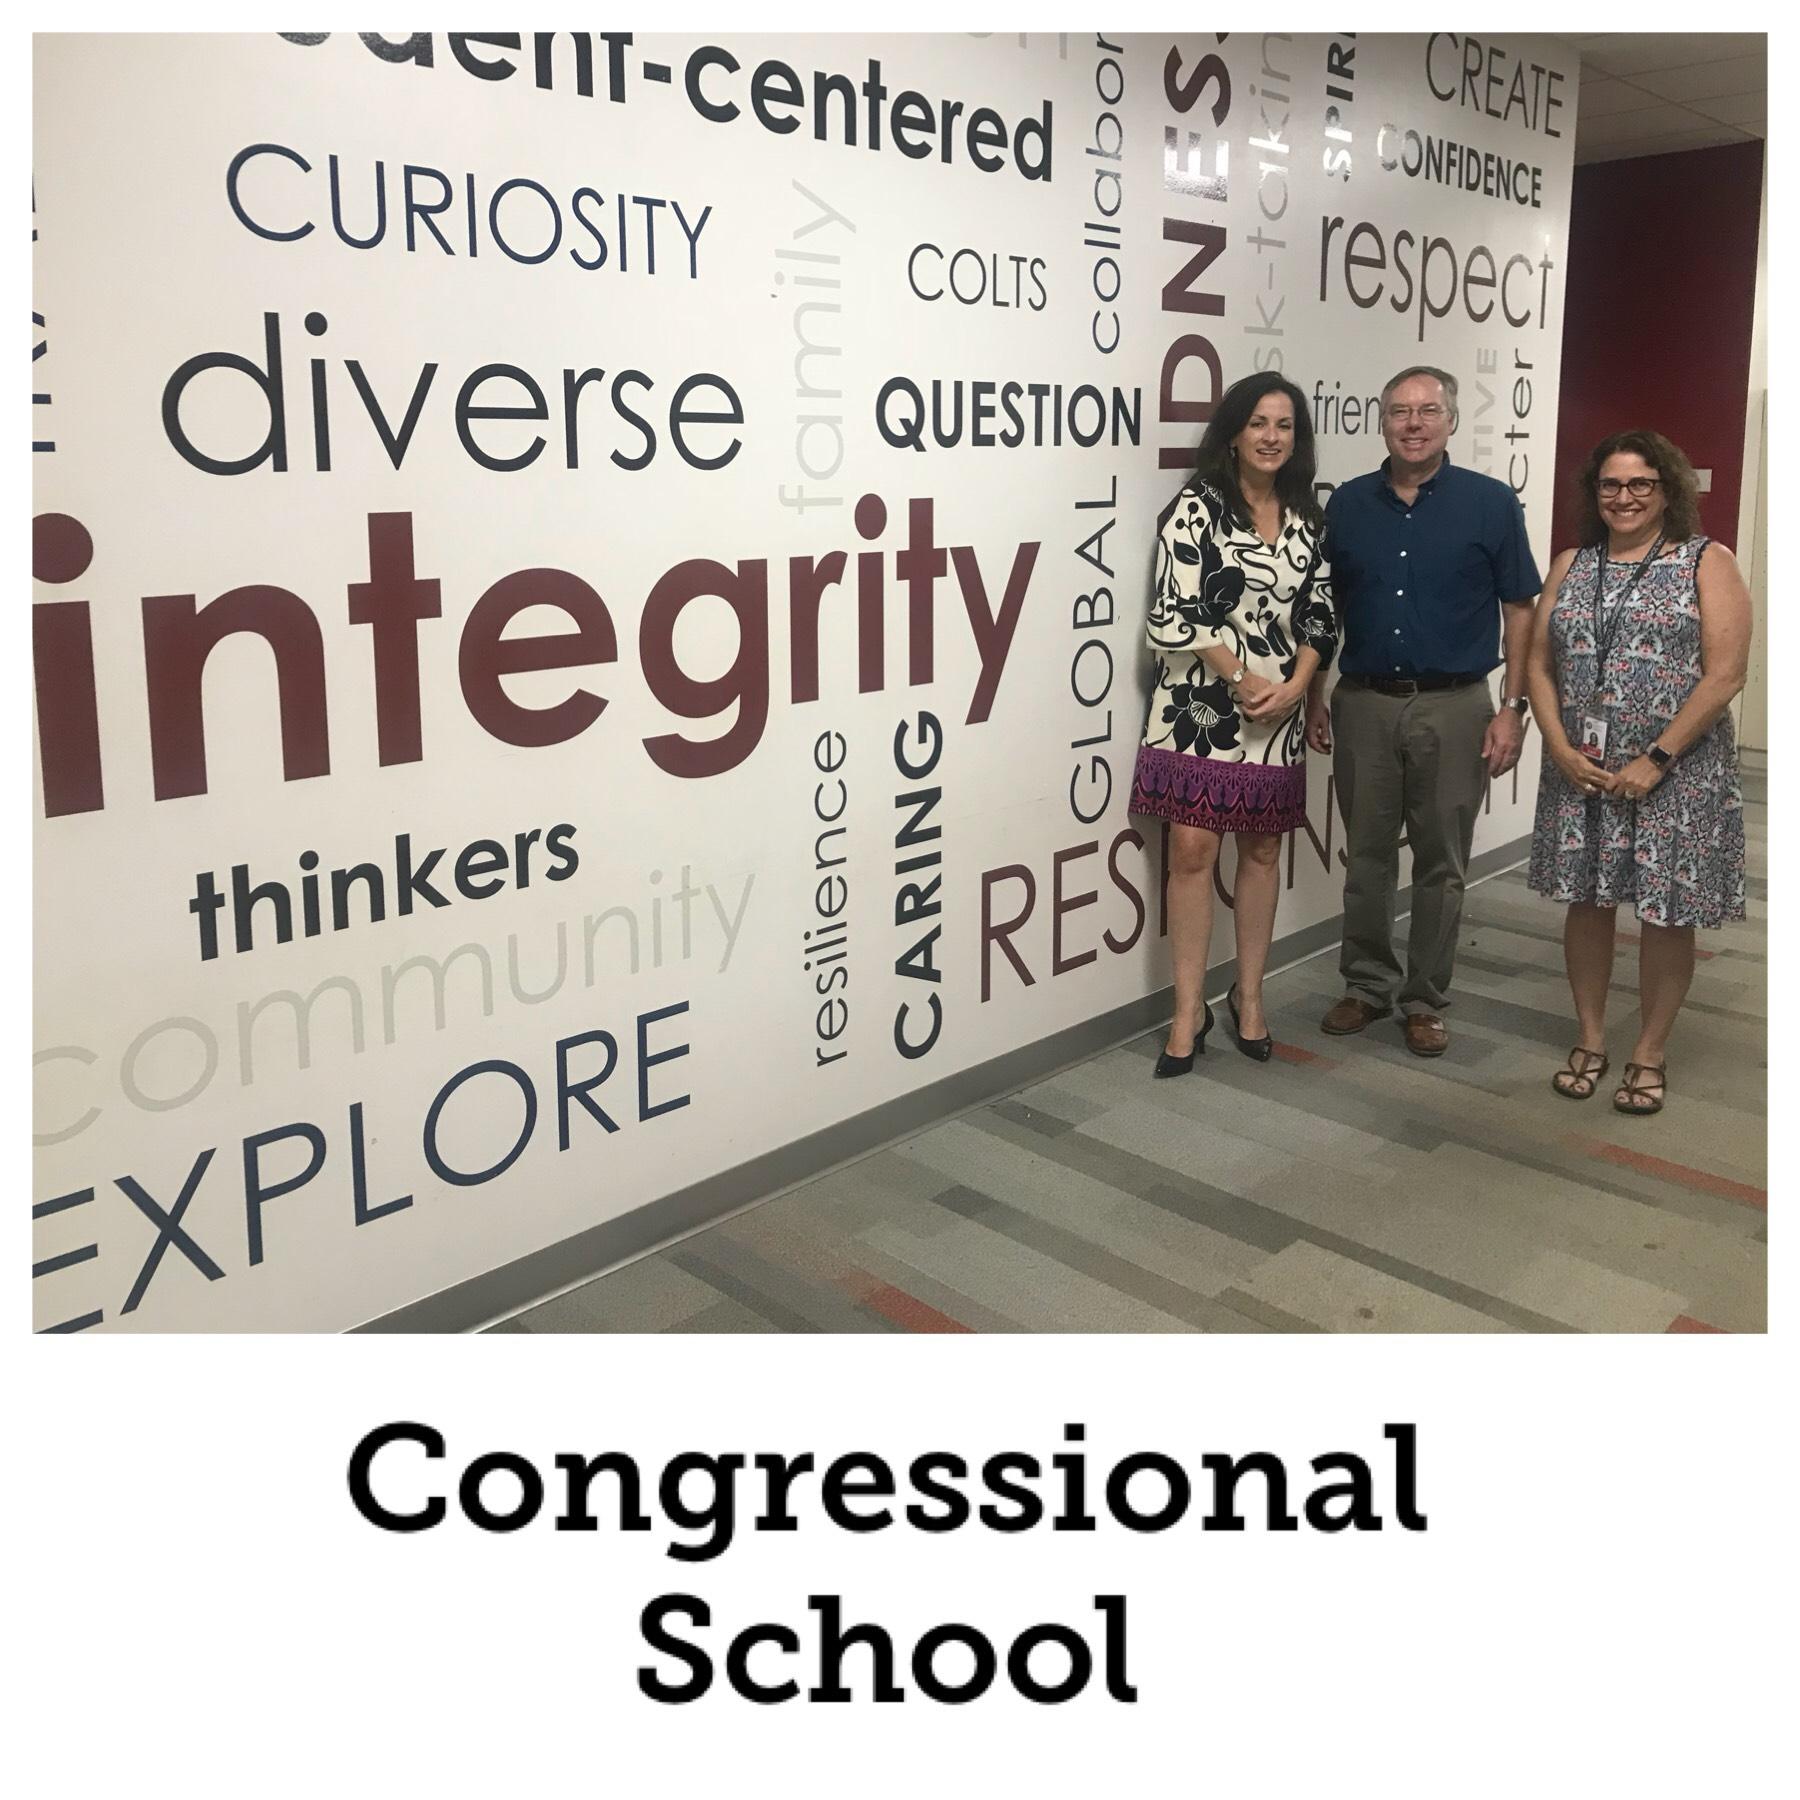 Congressional School